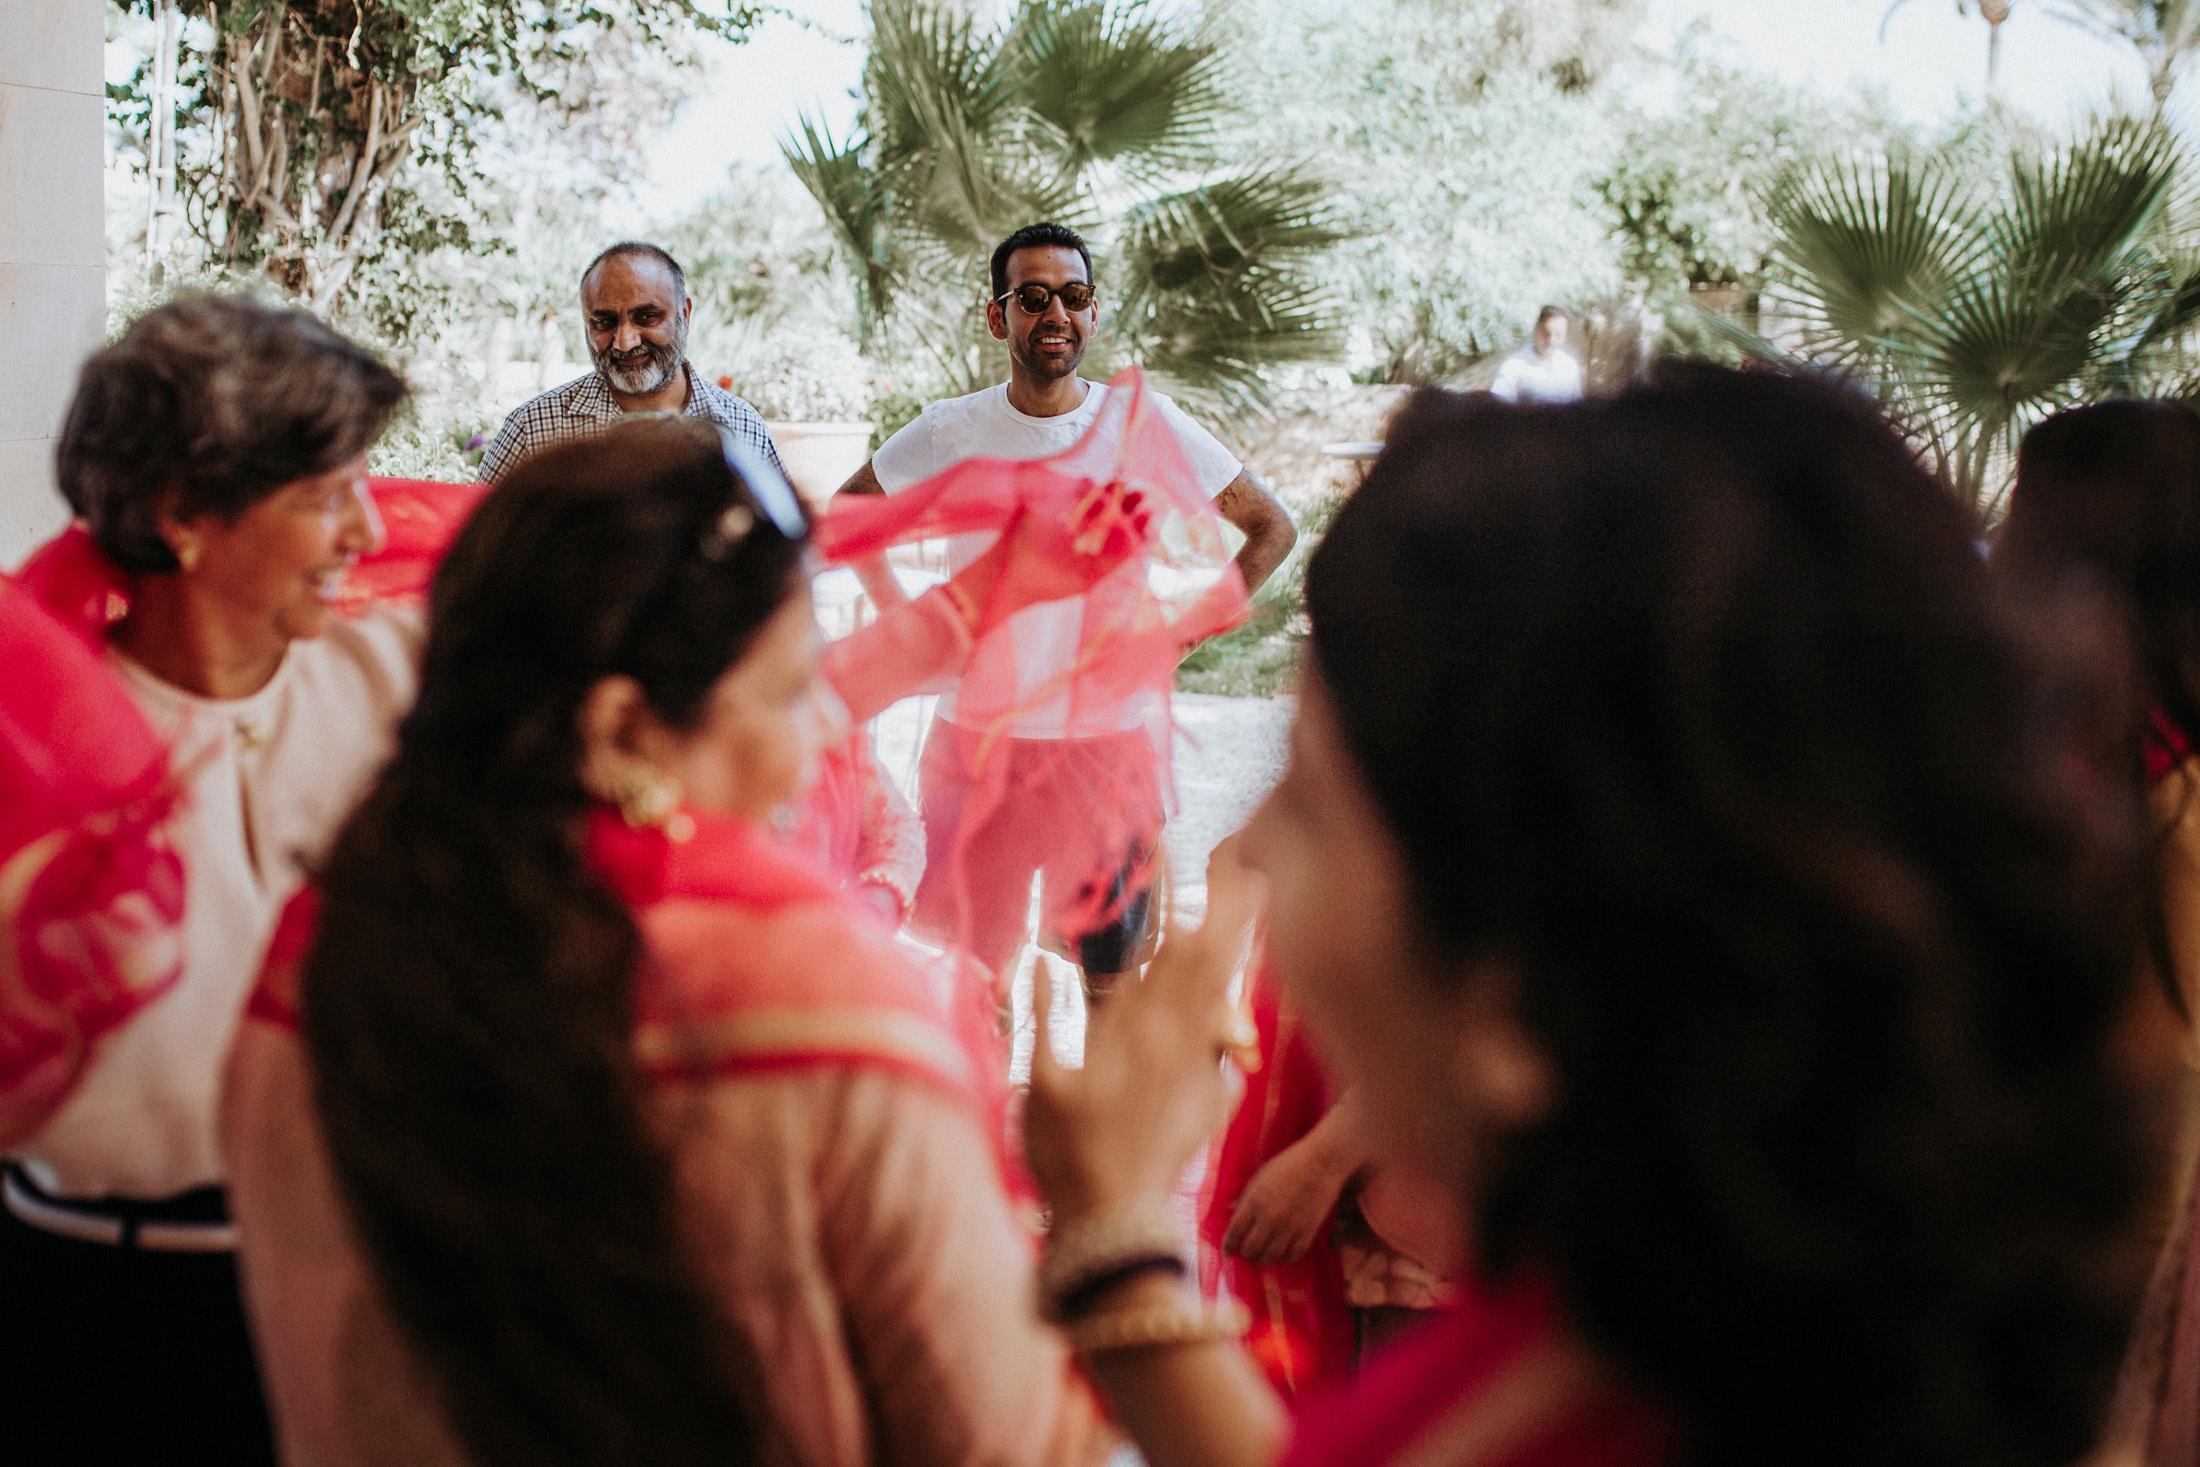 Wedding_Photographer_Mallorca_Daniela-Marquardt_Photography_New_York_Iceland_Tuscany_Santorini_Portugal_Austria_Bavaria_Elopement_Hochzeitsfotograf_AntjeRajat1_23